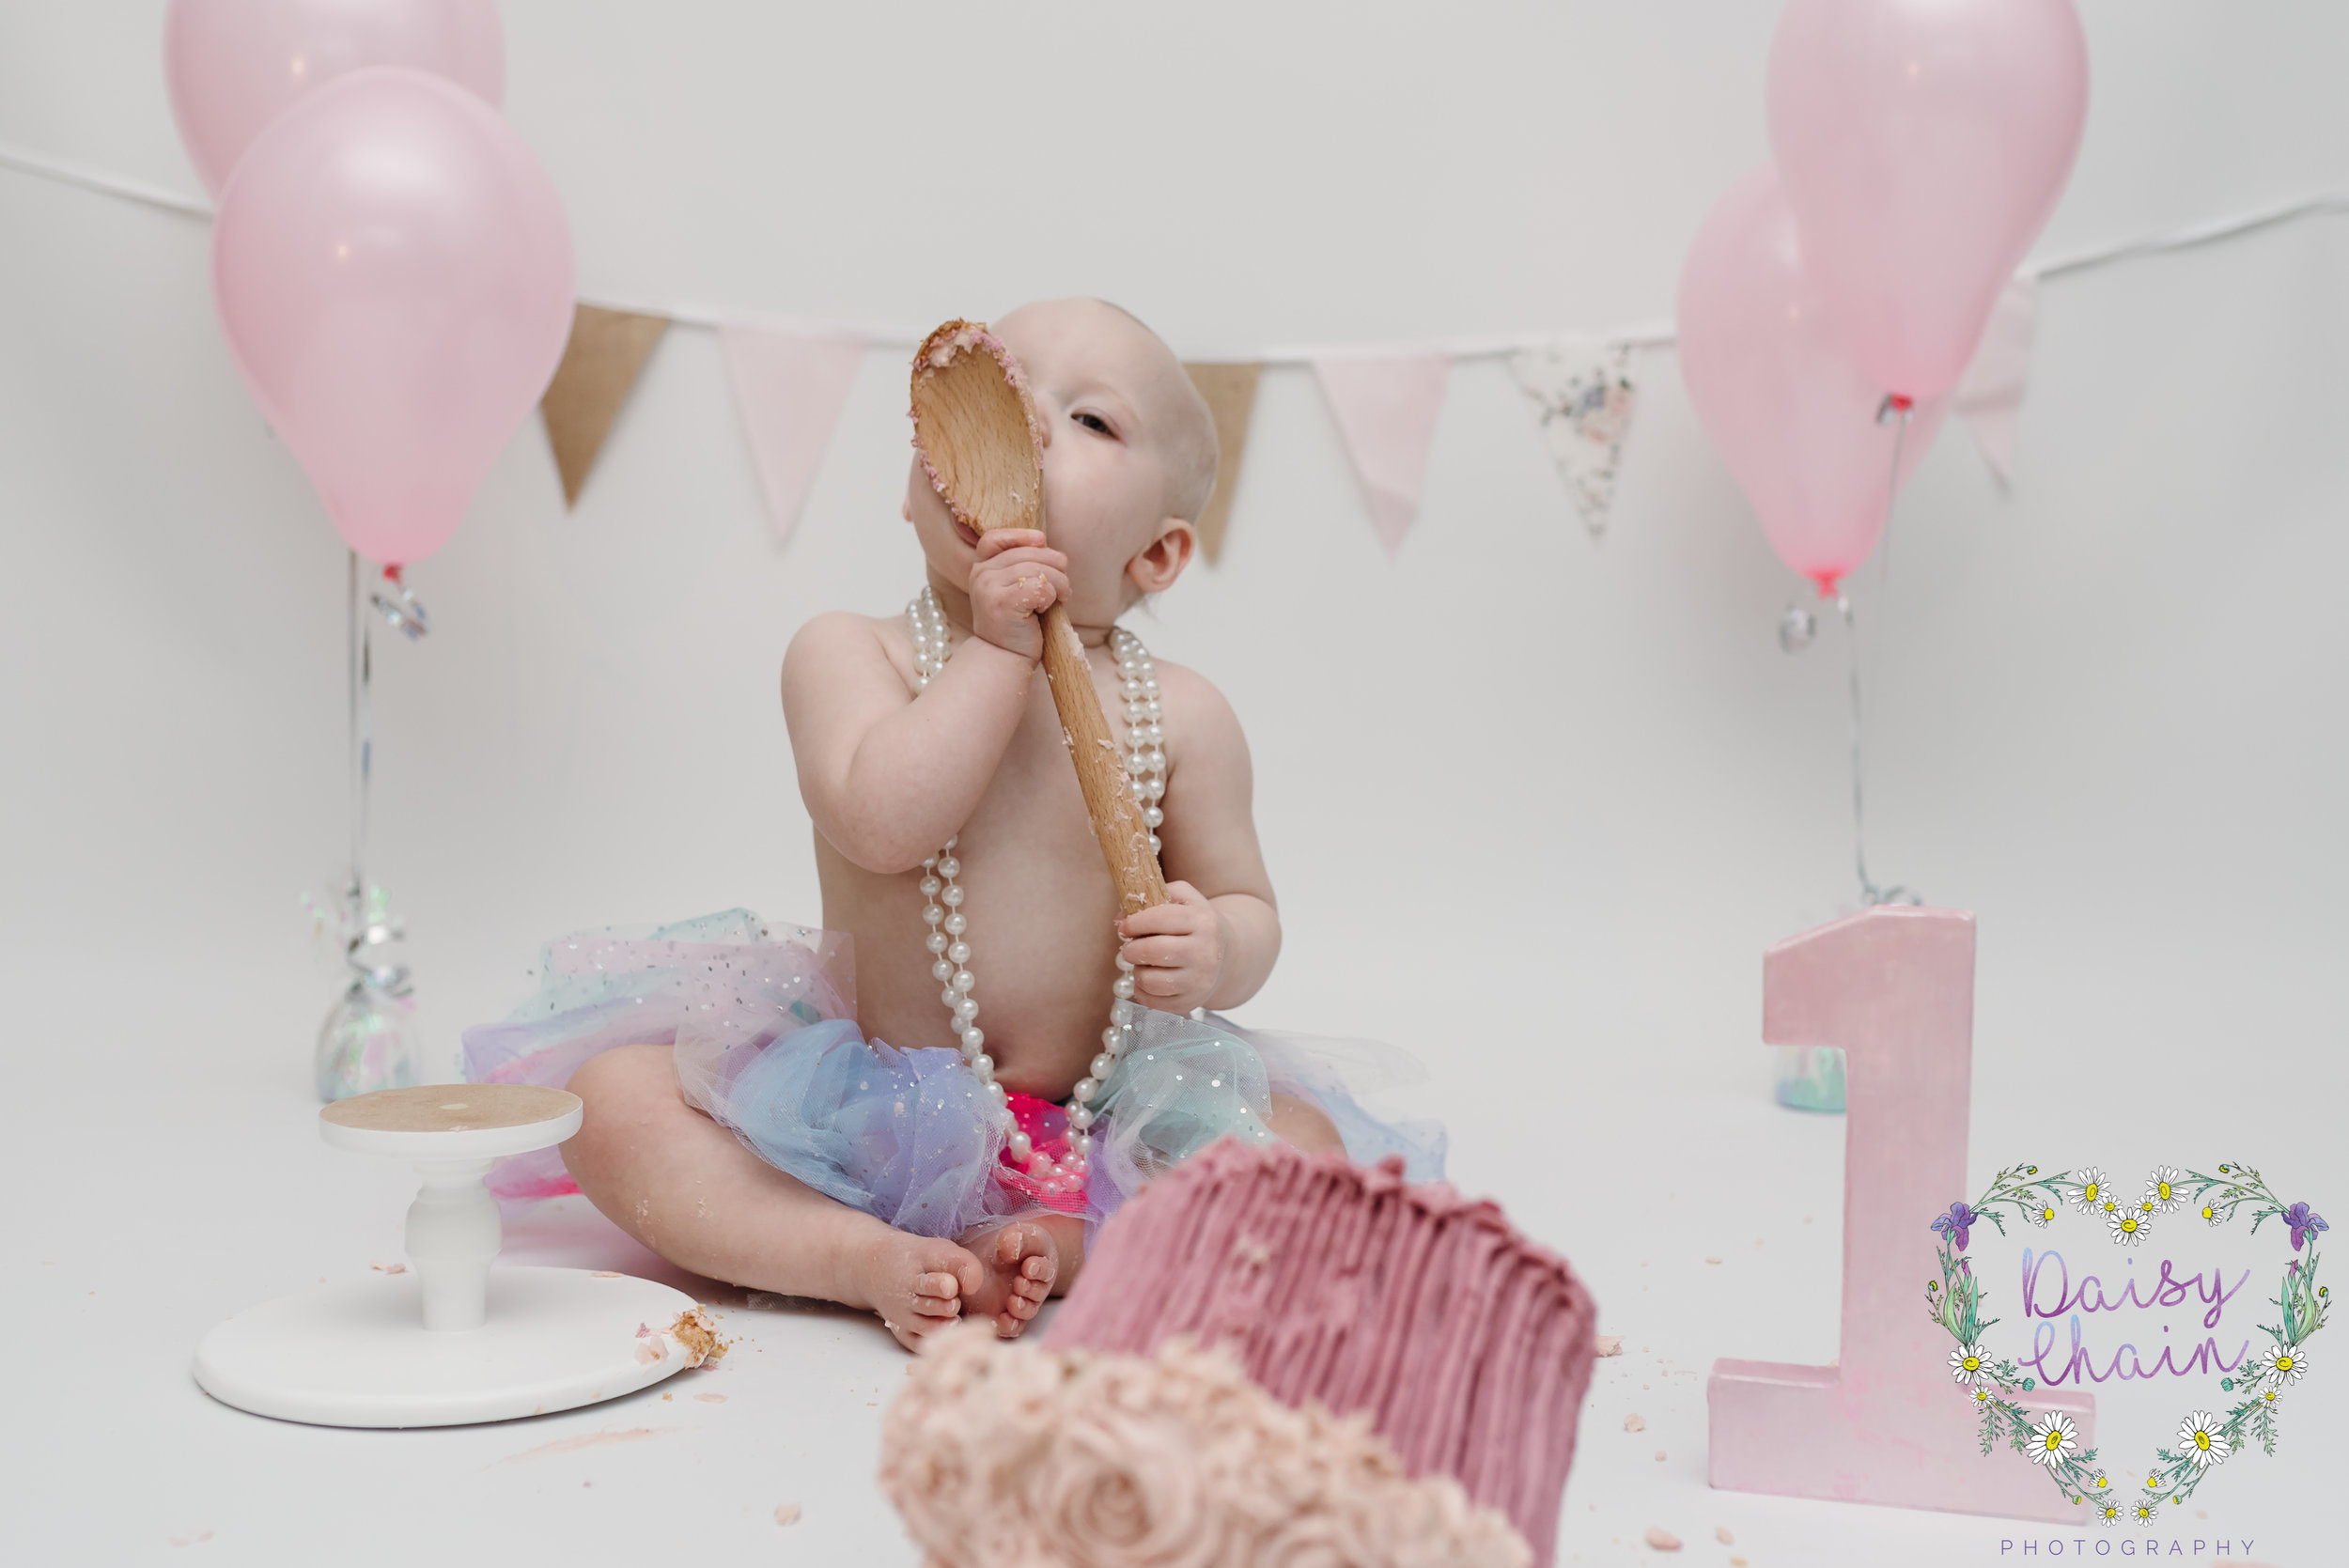 Cake - cake smash